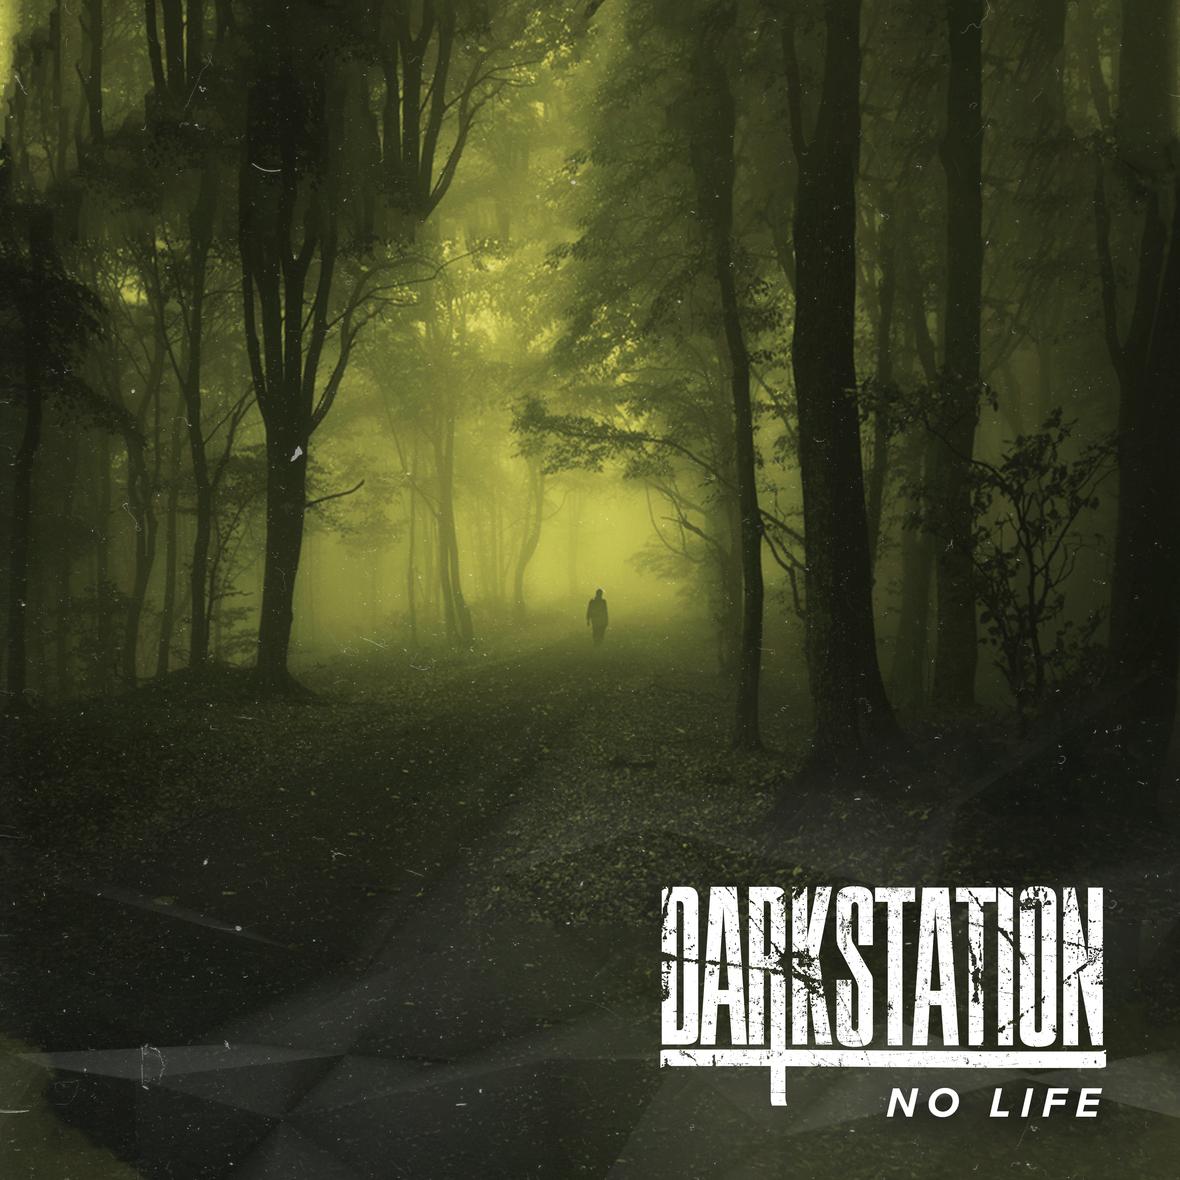 Dark Station SINGLE No Life